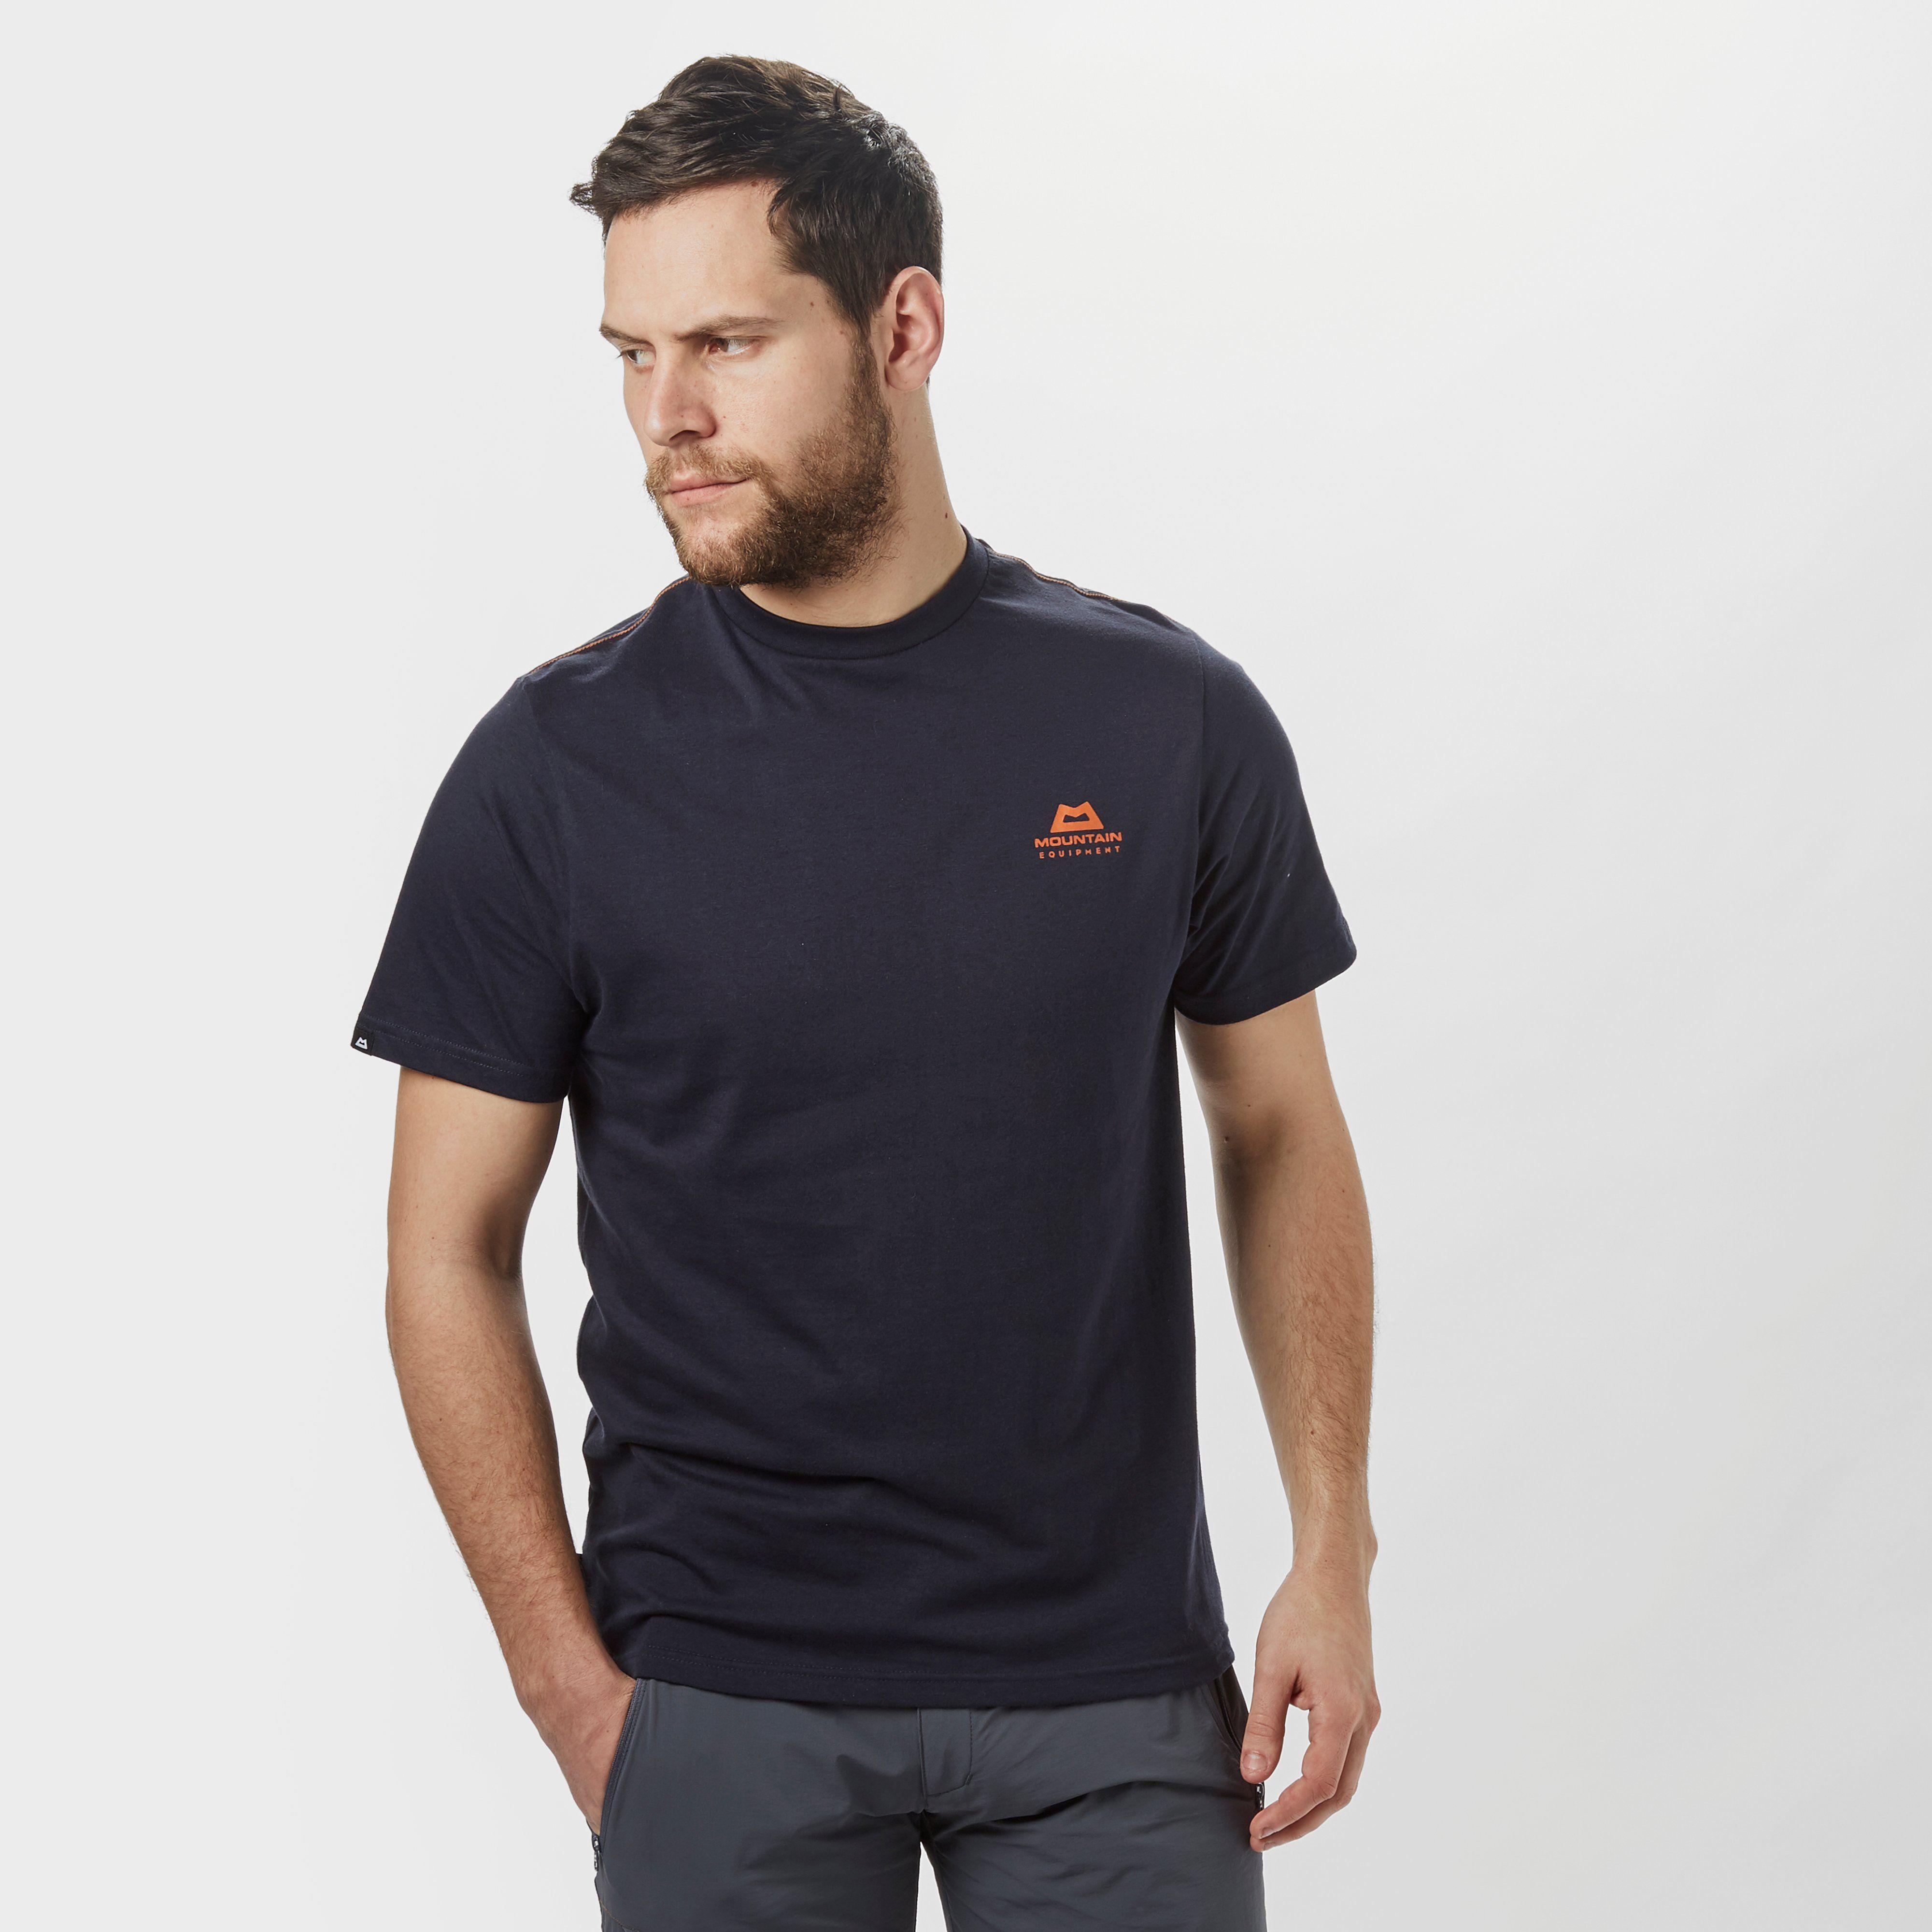 MOUNTAIN EQUIPMENT Men's Crib T-Shirt